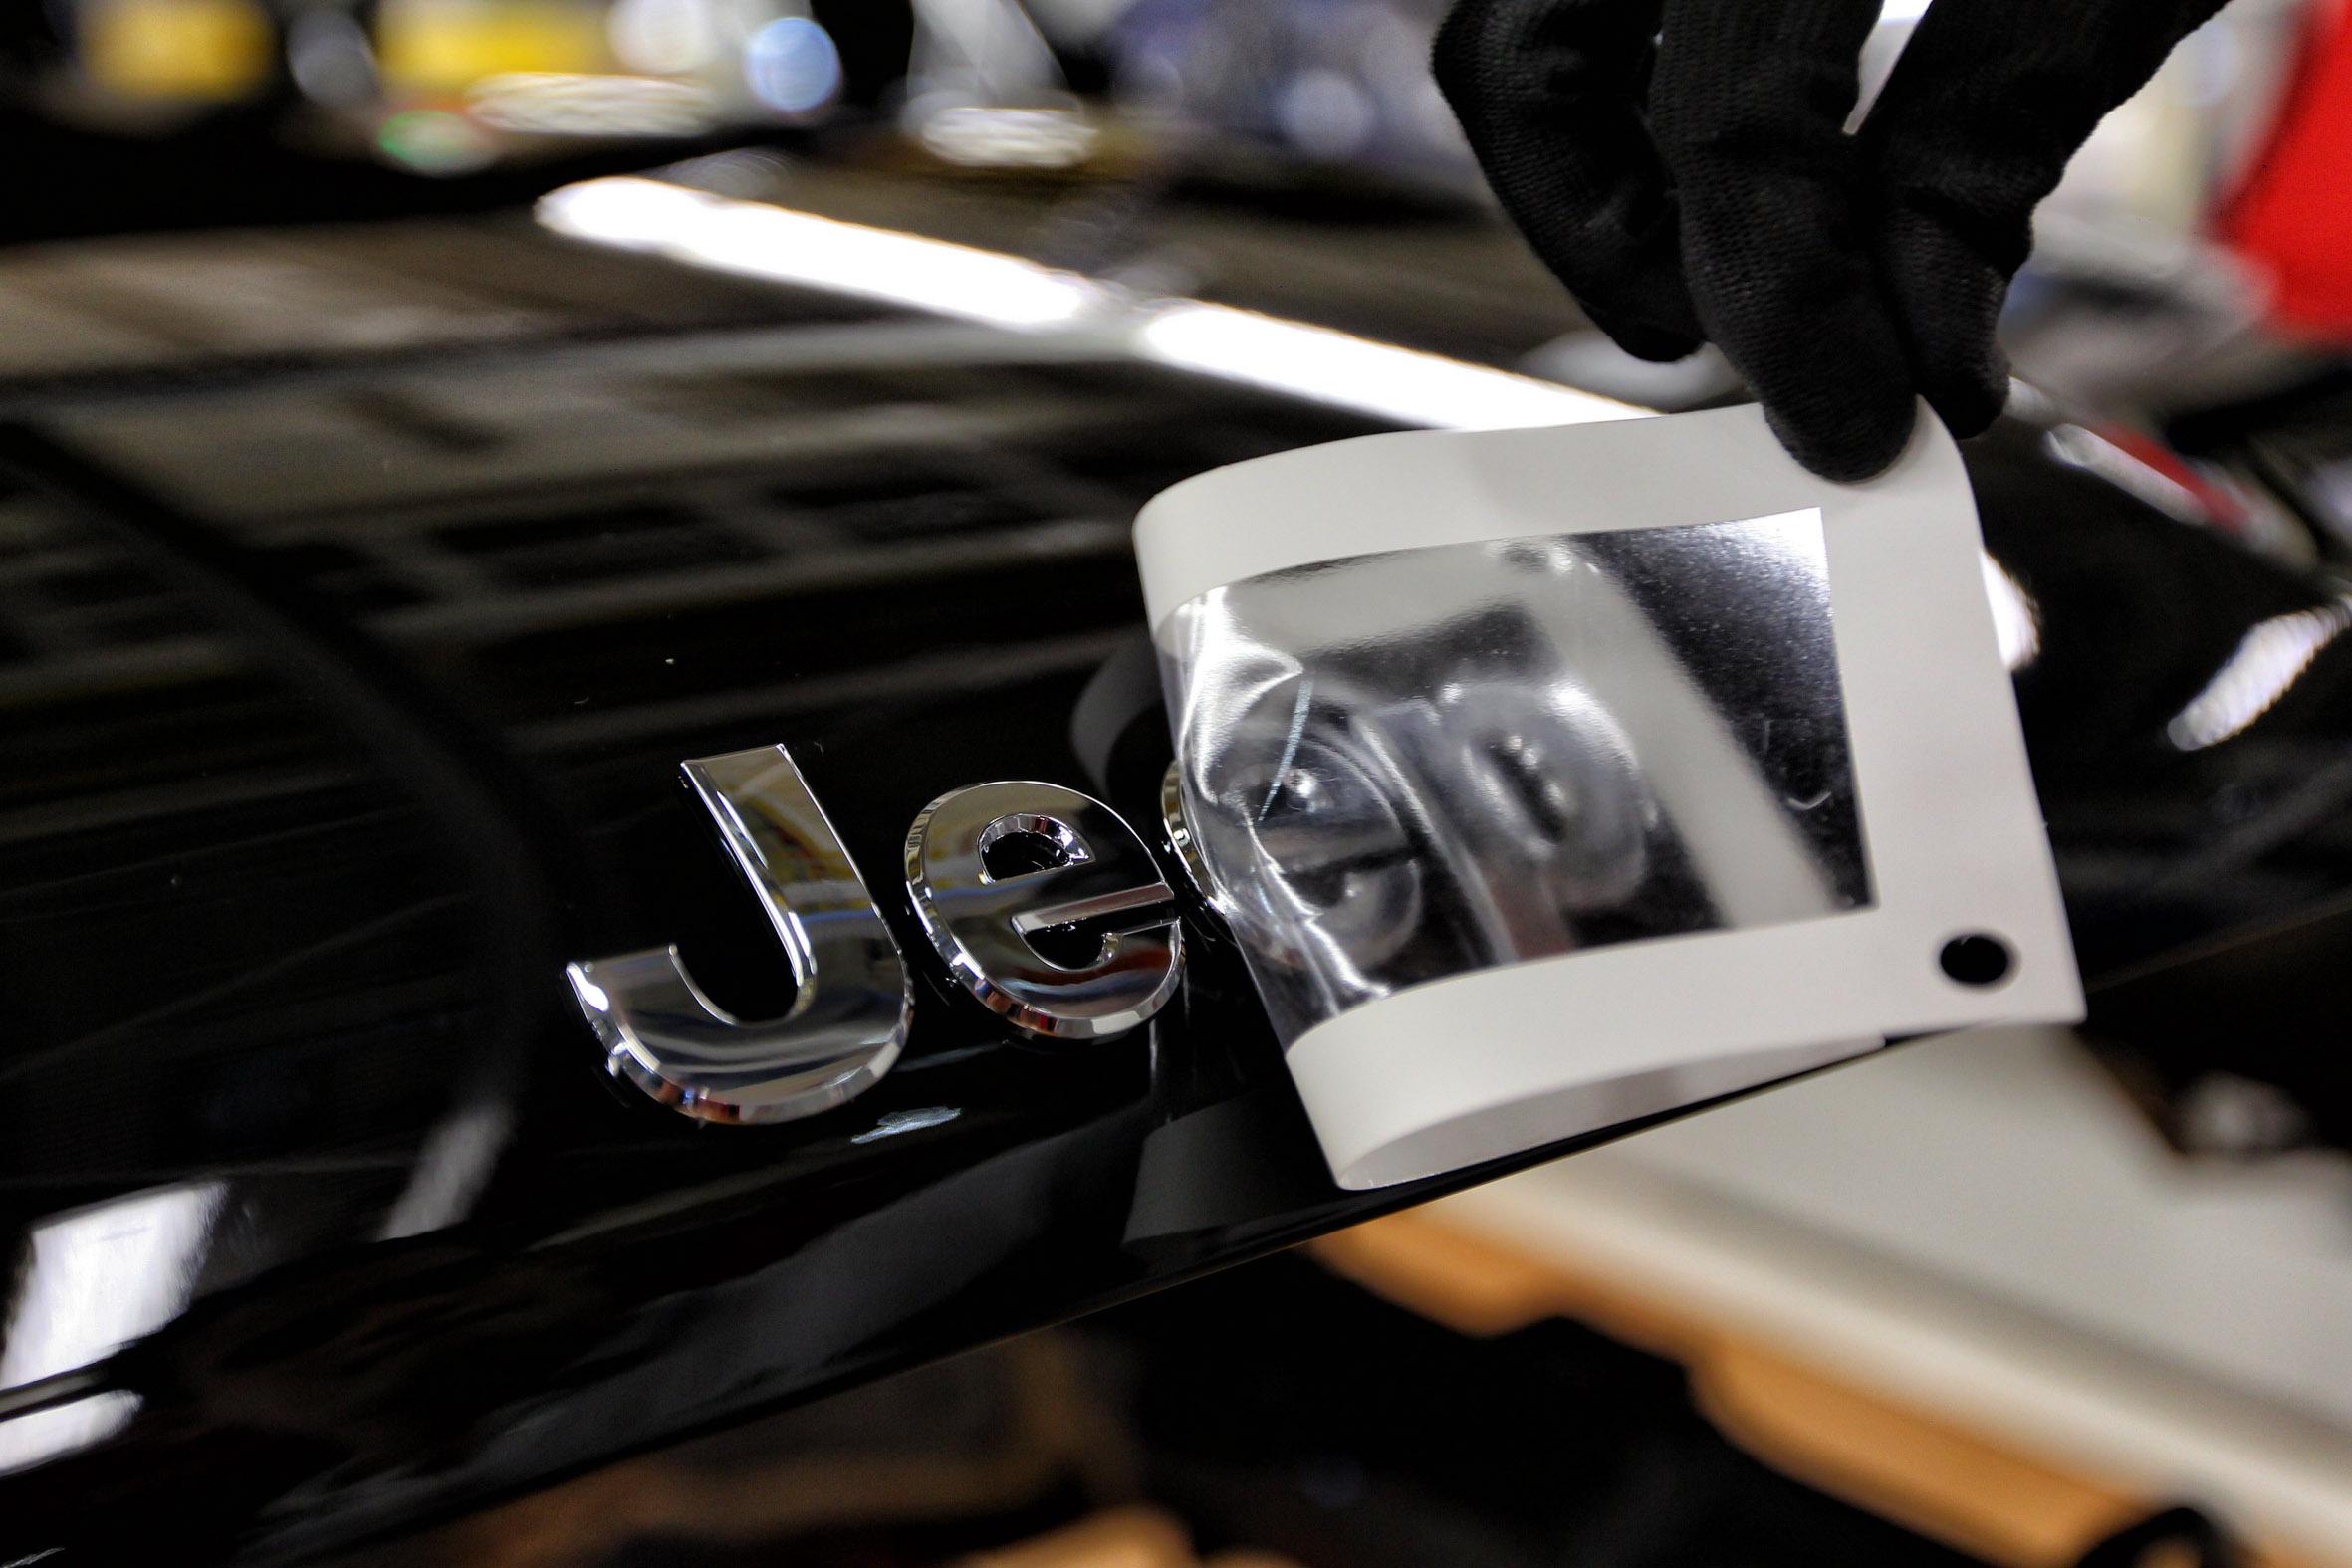 Jeep Renegade - Goiana/Pernambuco